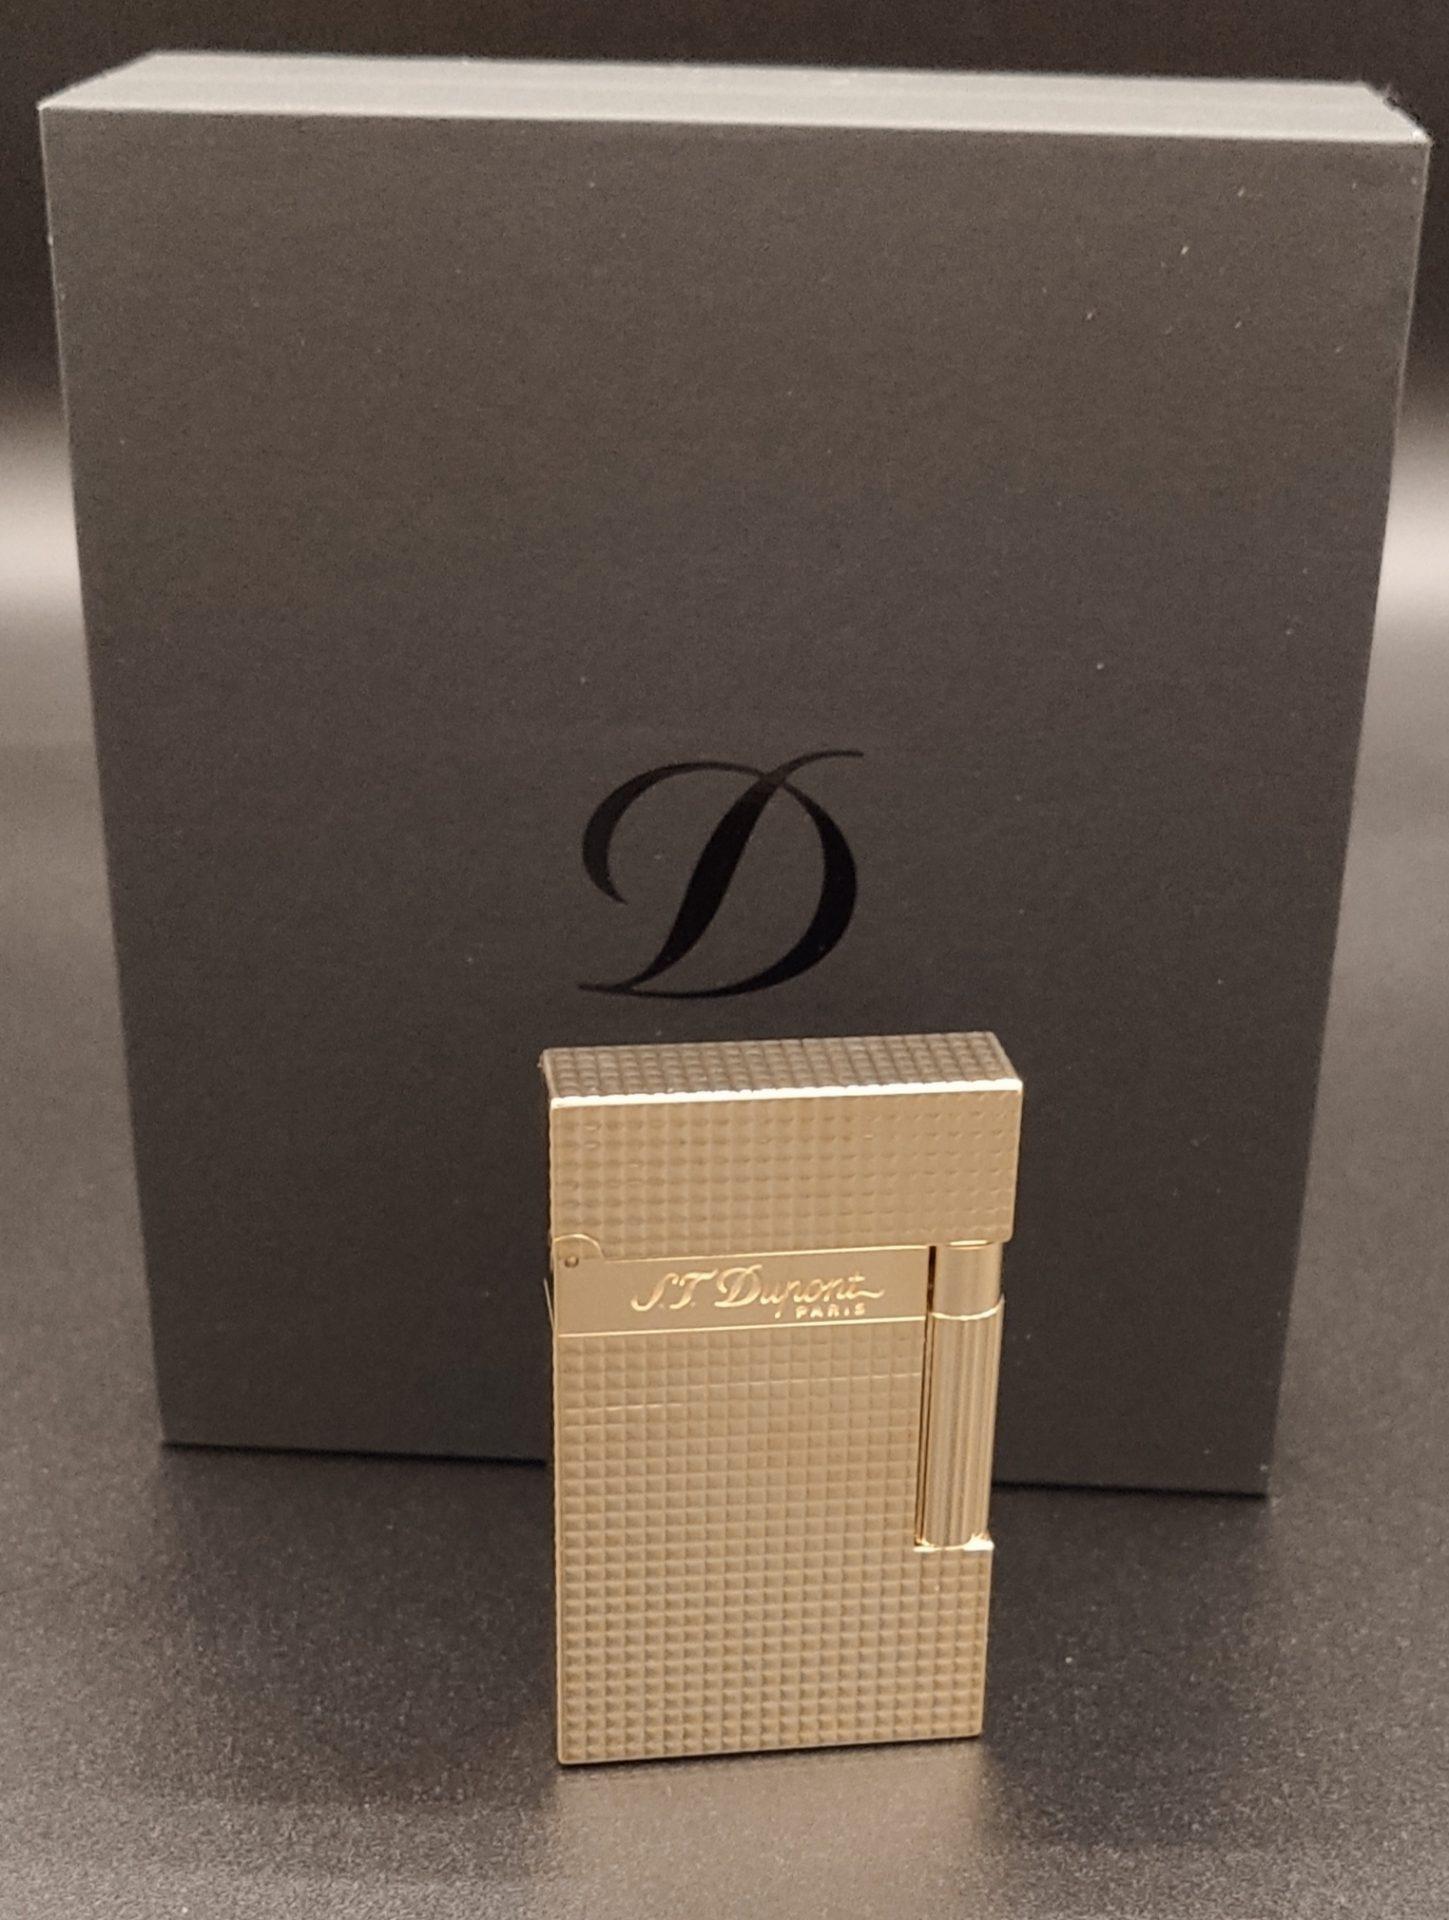 Dupont LI L2 Diamond head yel gold